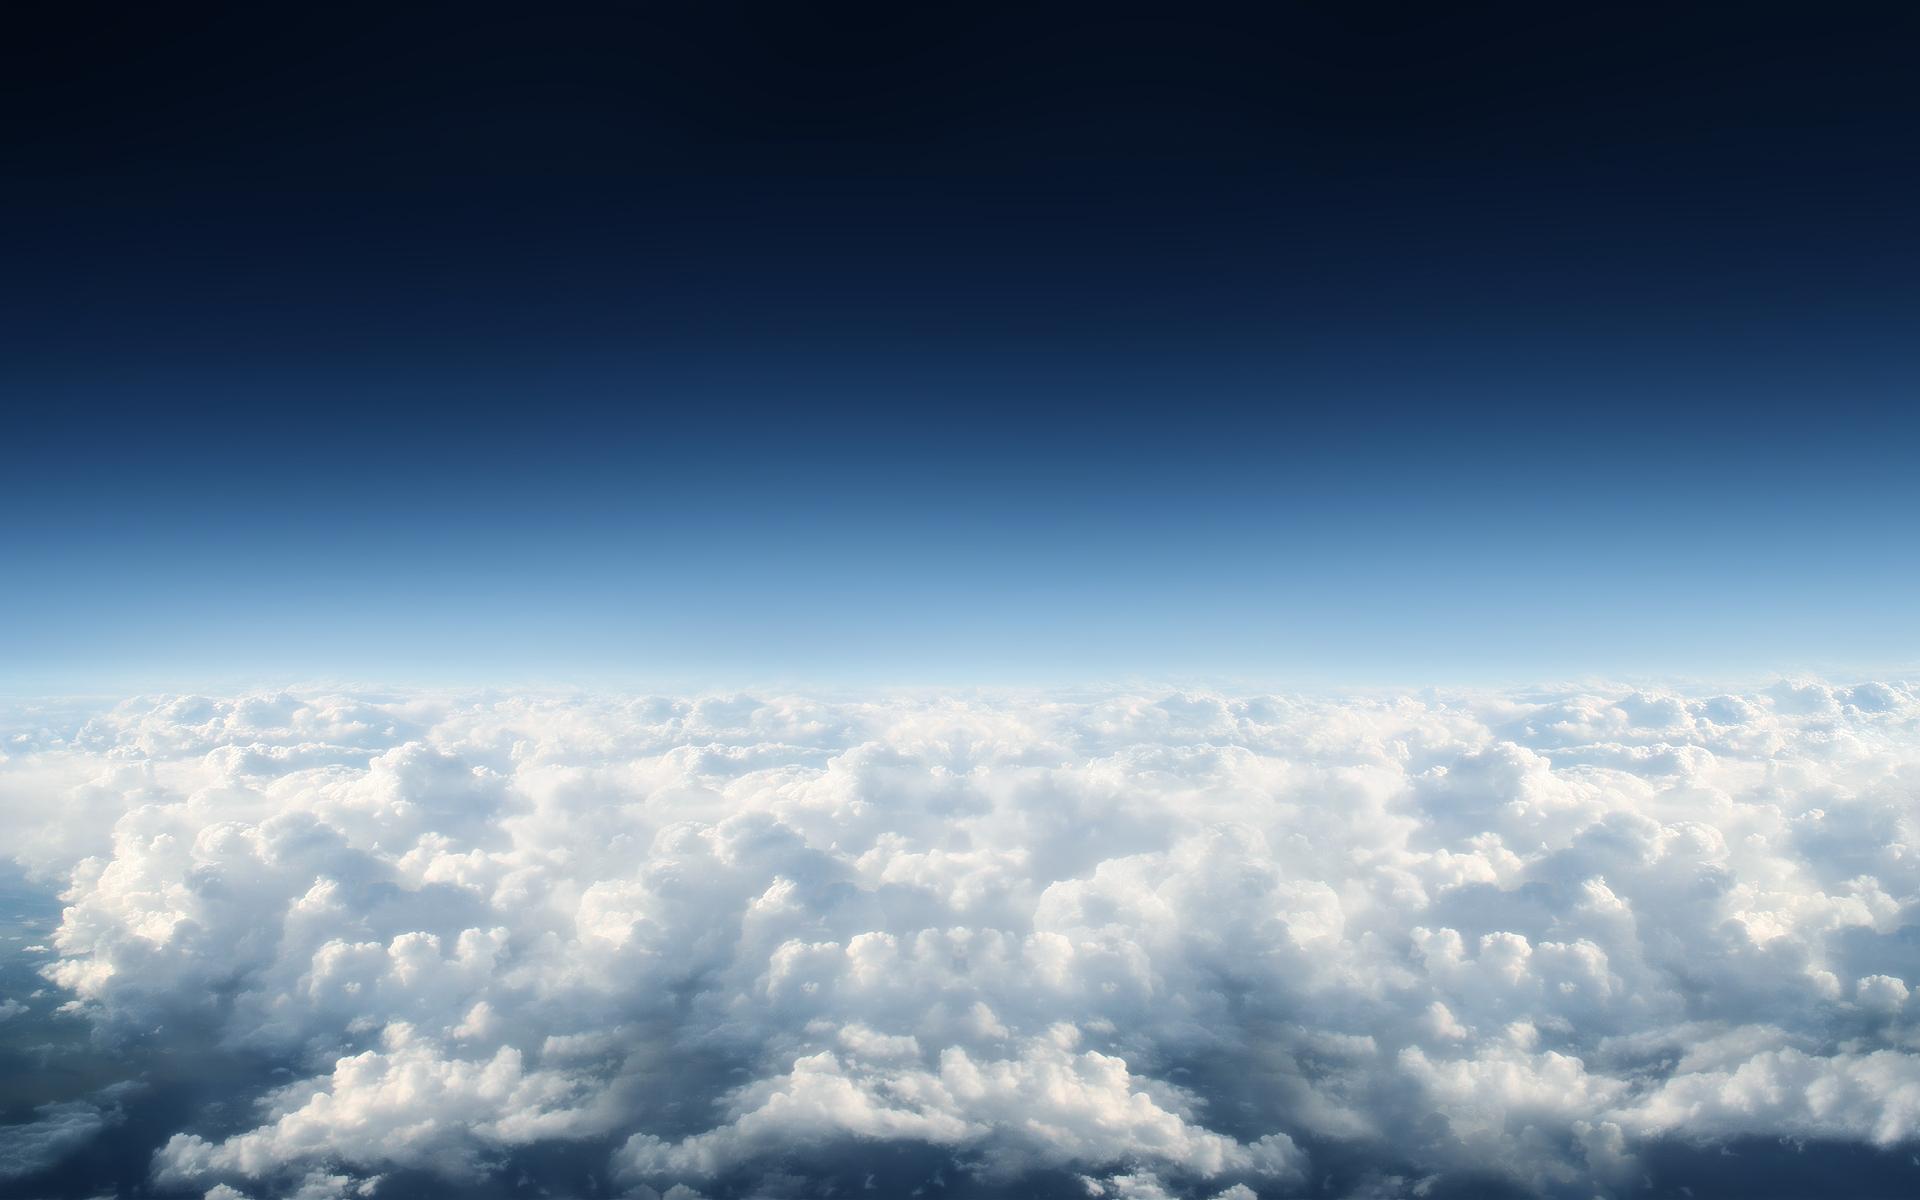 Cloud Wallpaper 21892 1920x1200 px HDWallSourcecom